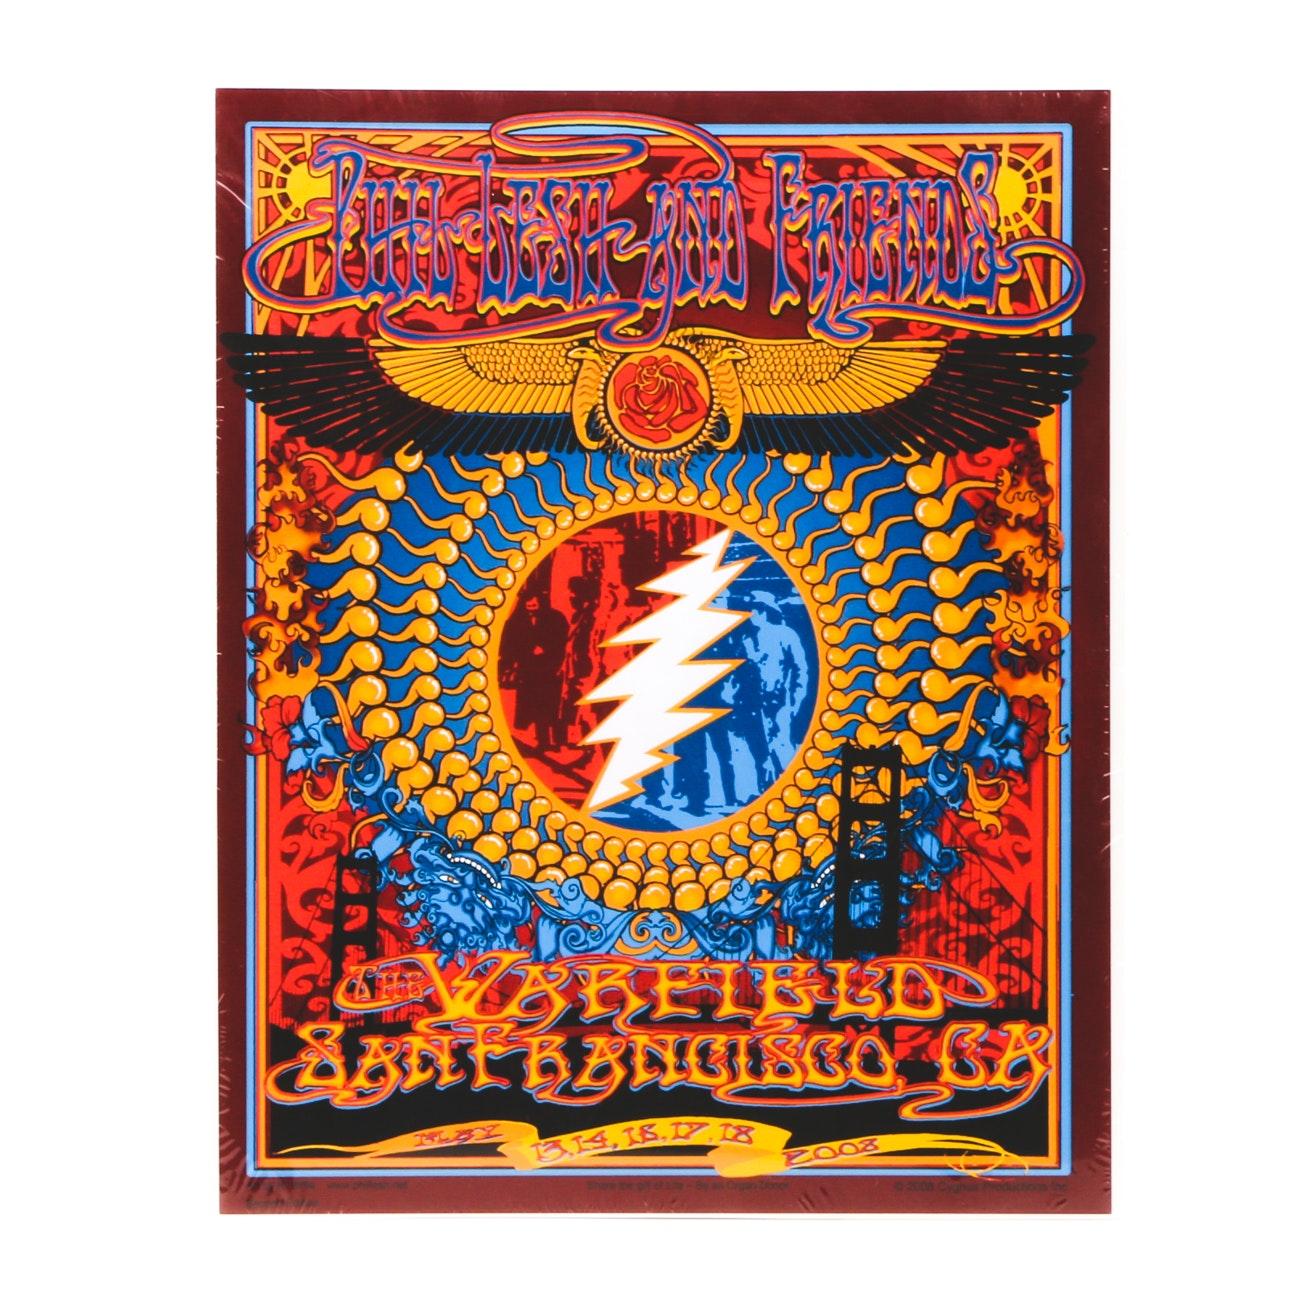 2008 Phil Lesh and Friends/Grateful Dead Concert Poster